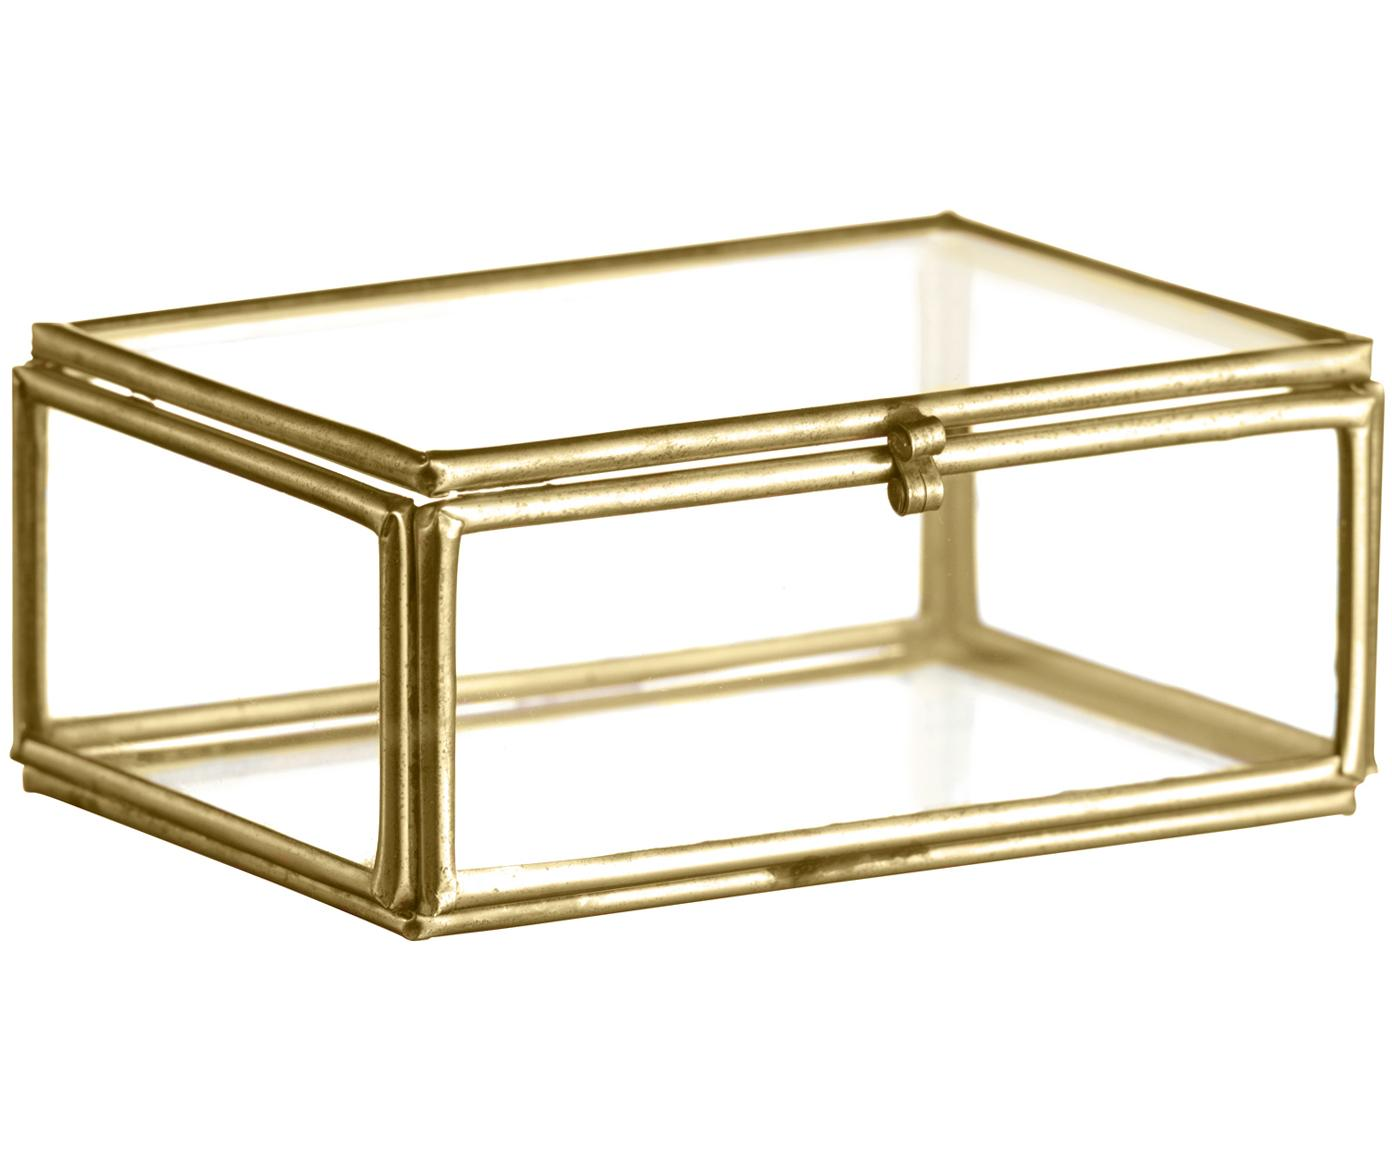 Aufbewahrungsbox Ivey, Rahmen: Metall, beschichtet, Messingfarben, 9 x 4 cm